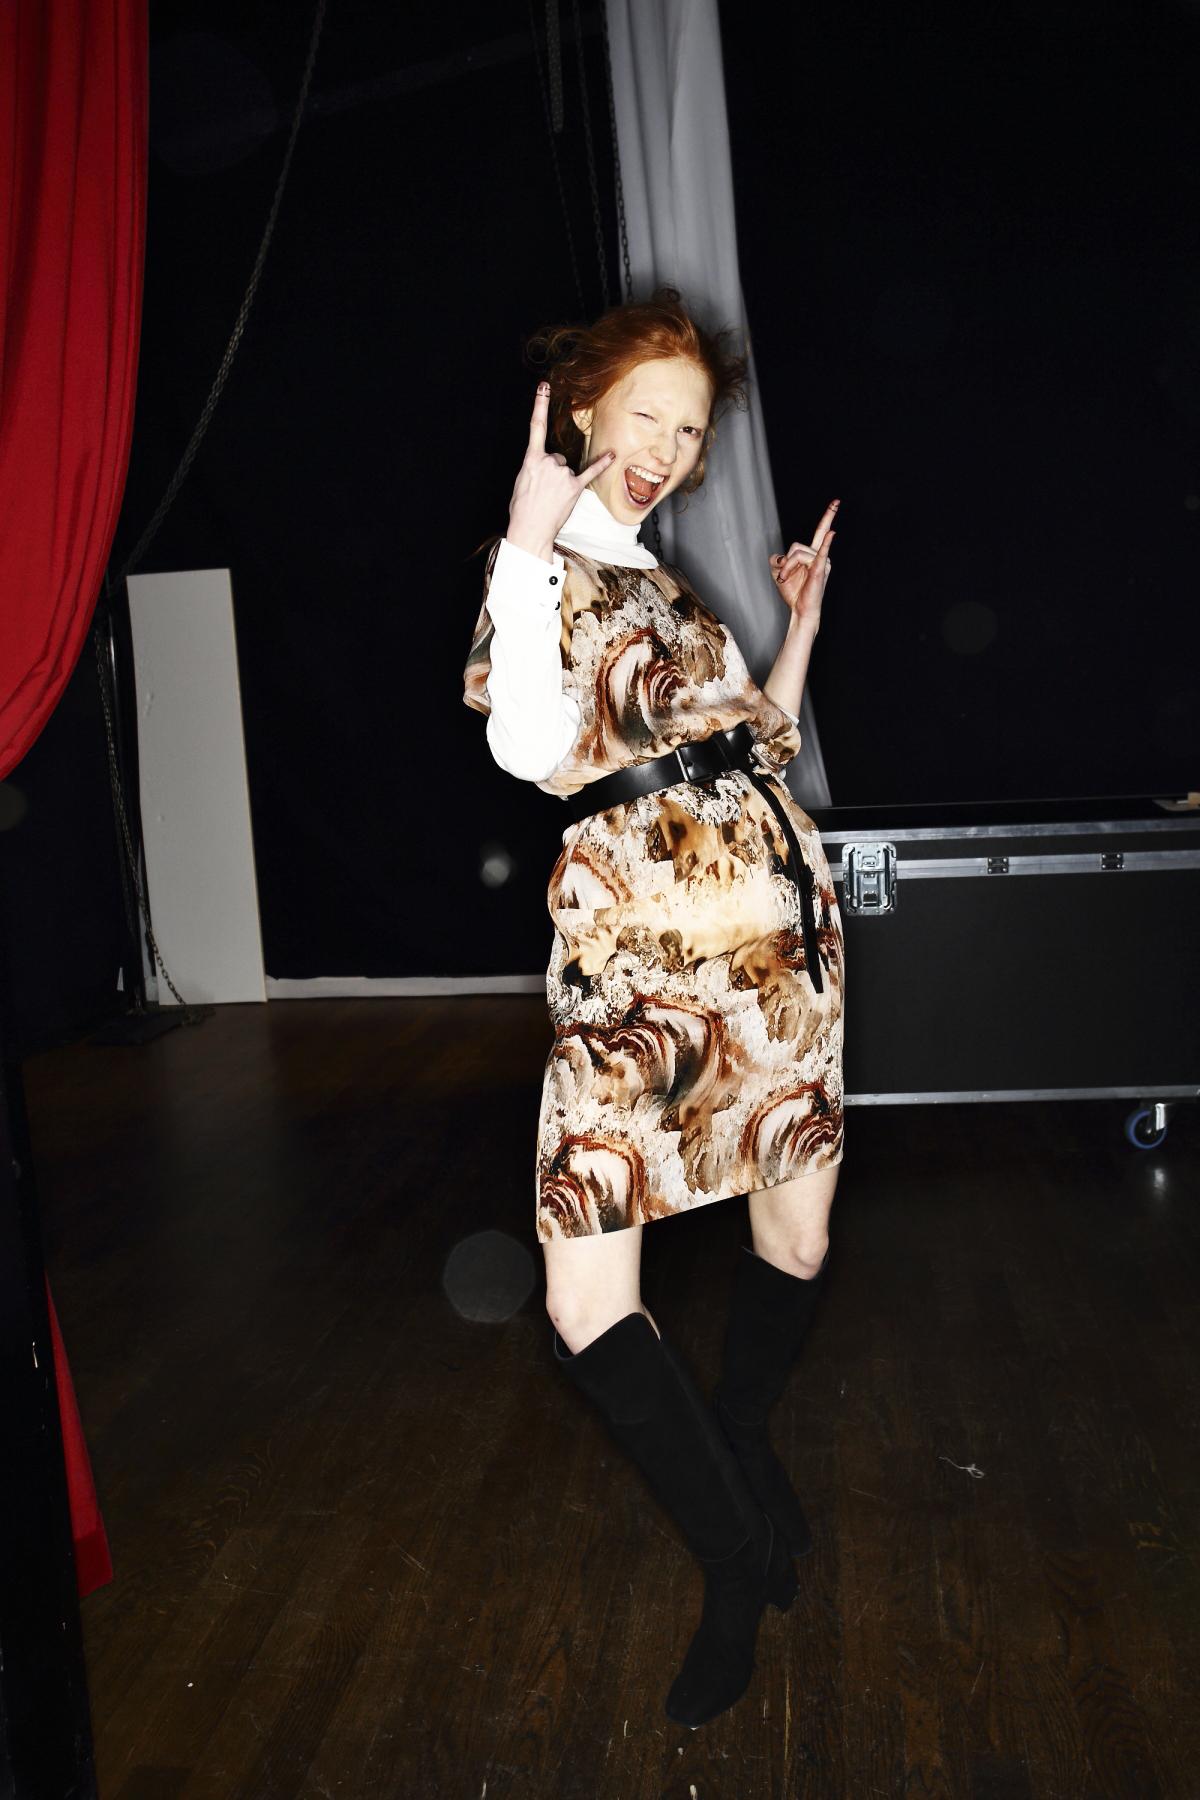 Valerie AW1617 Fashion Show at Berns Stockholm Backstage